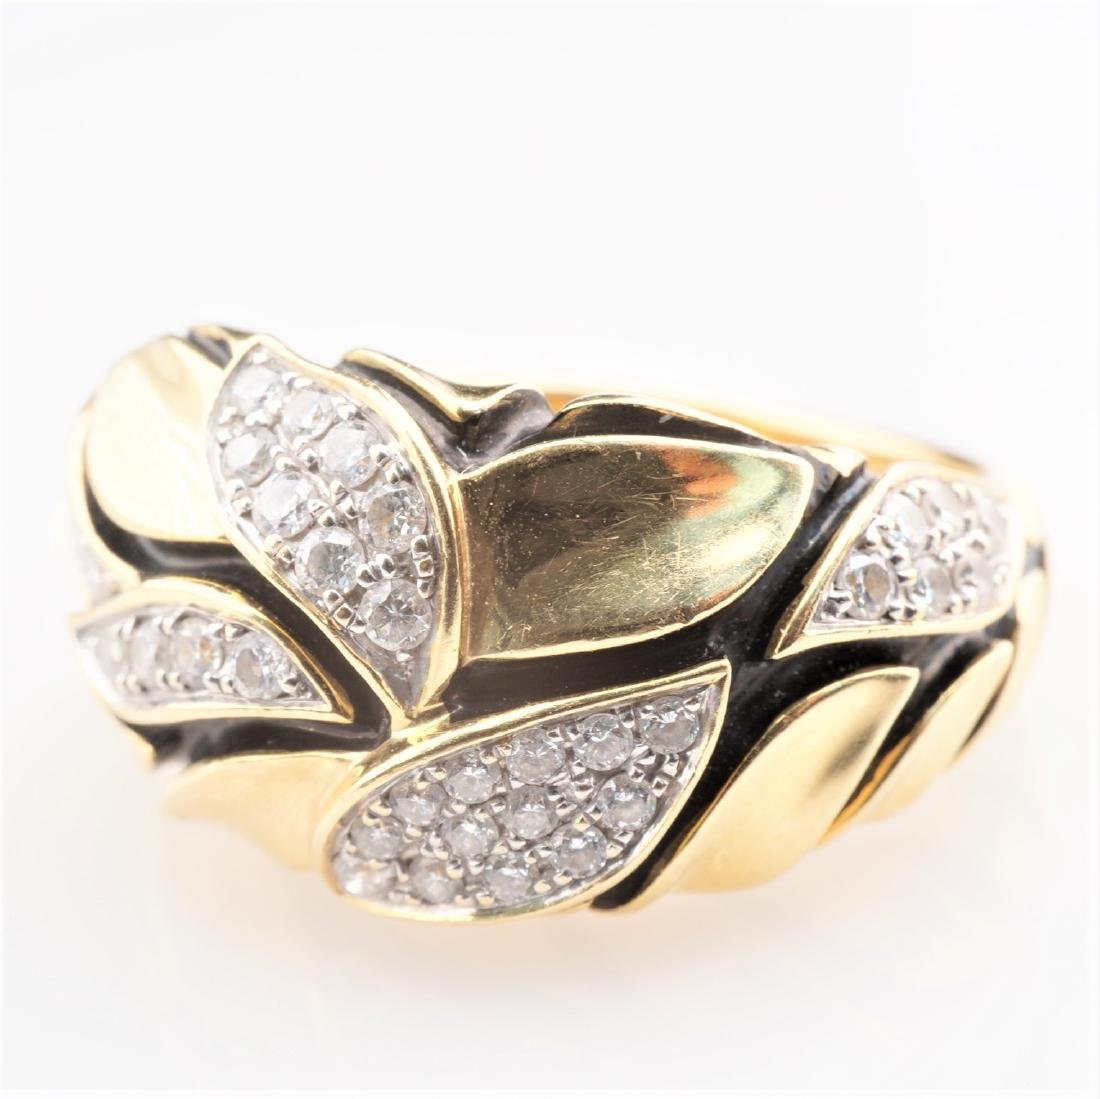 18K YG Enamel and Diamond Leaf Ring sz 7